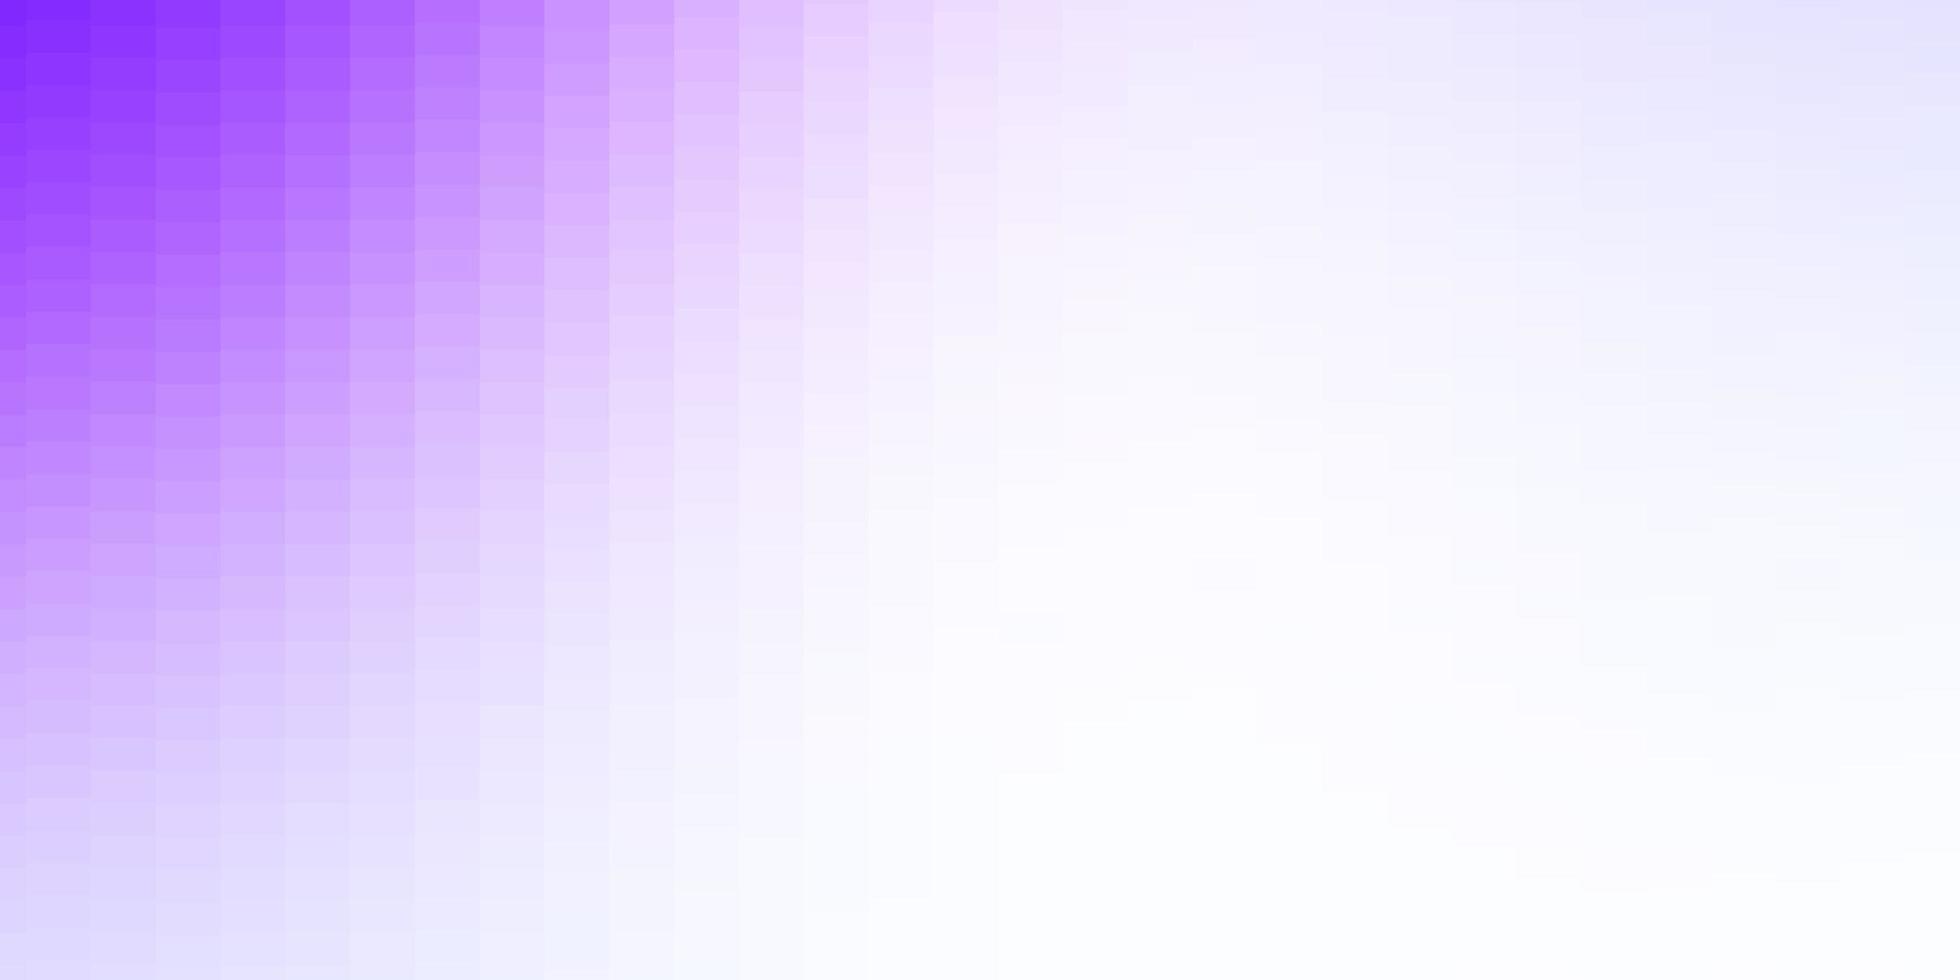 ljuslila vektorlayout med linjer, rektanglar. vektor